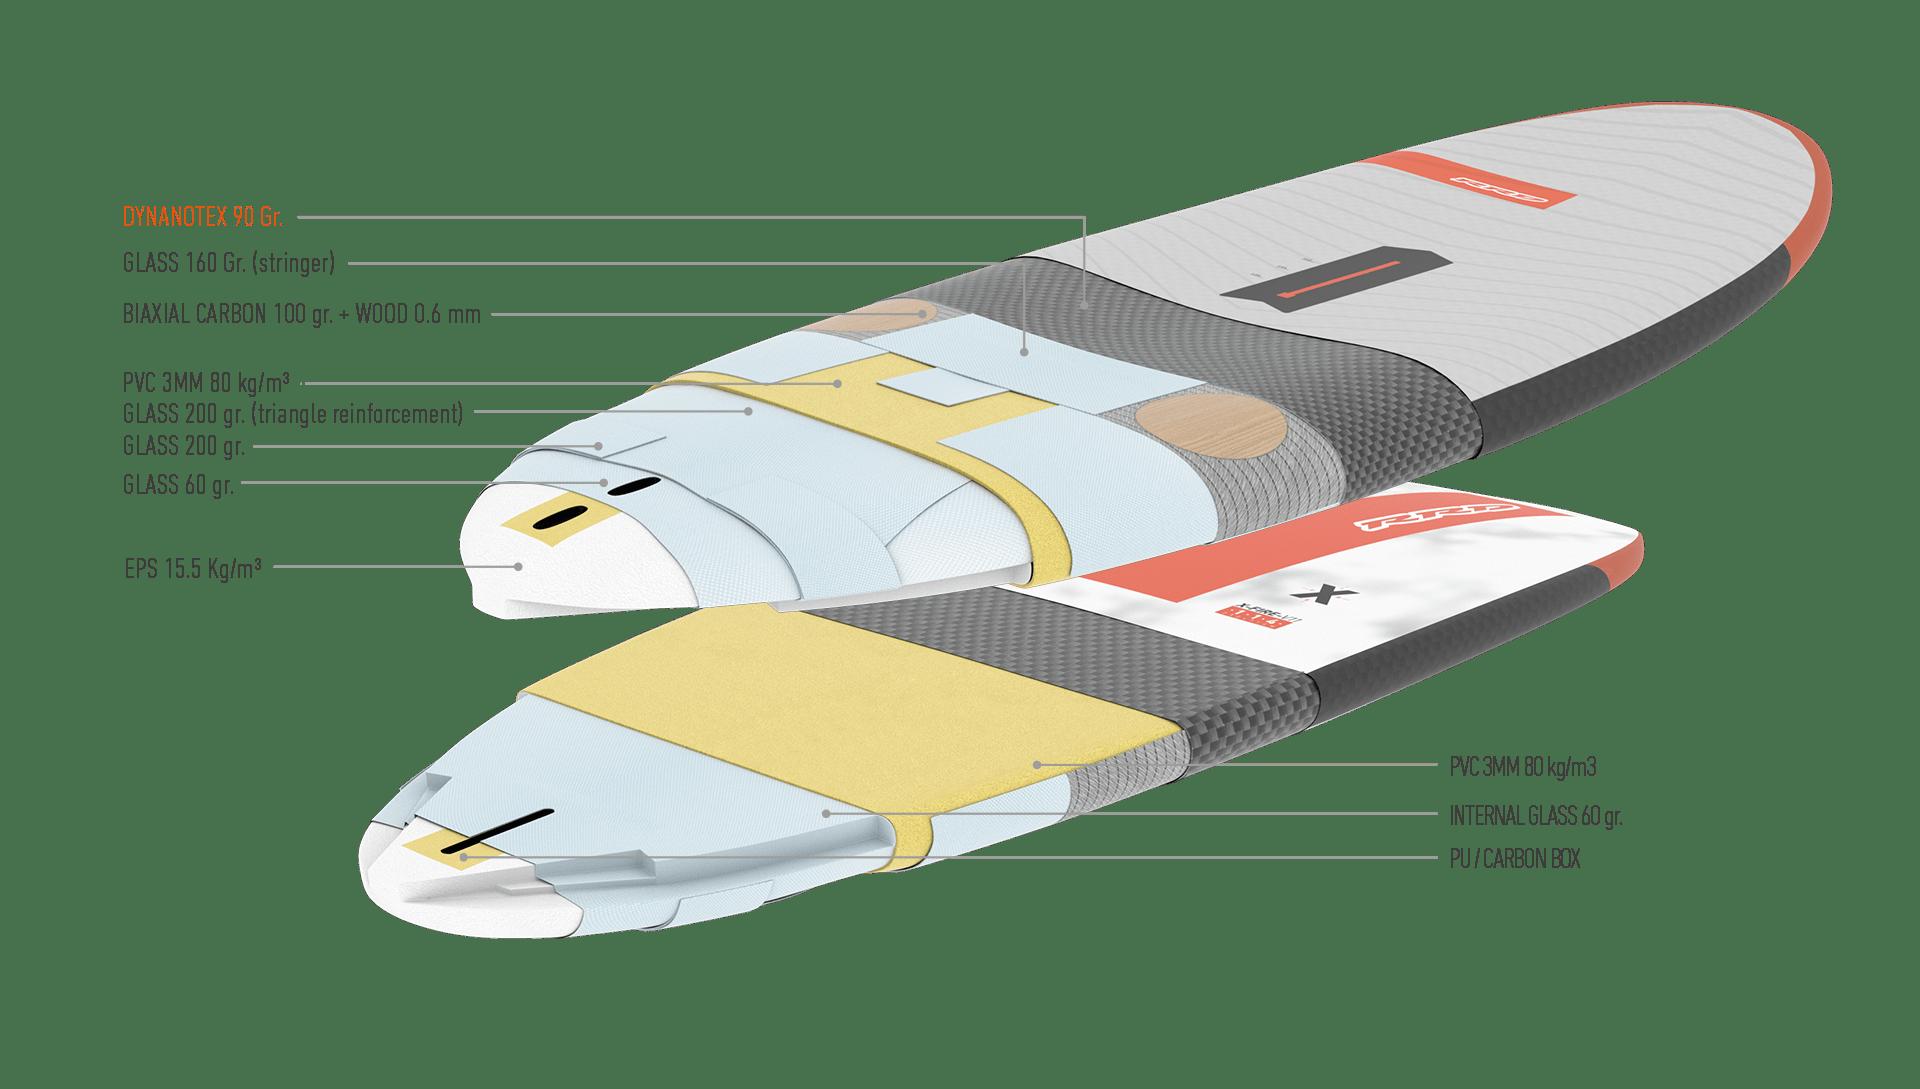 rrd-ltd-ws-tech-x-fire-v11